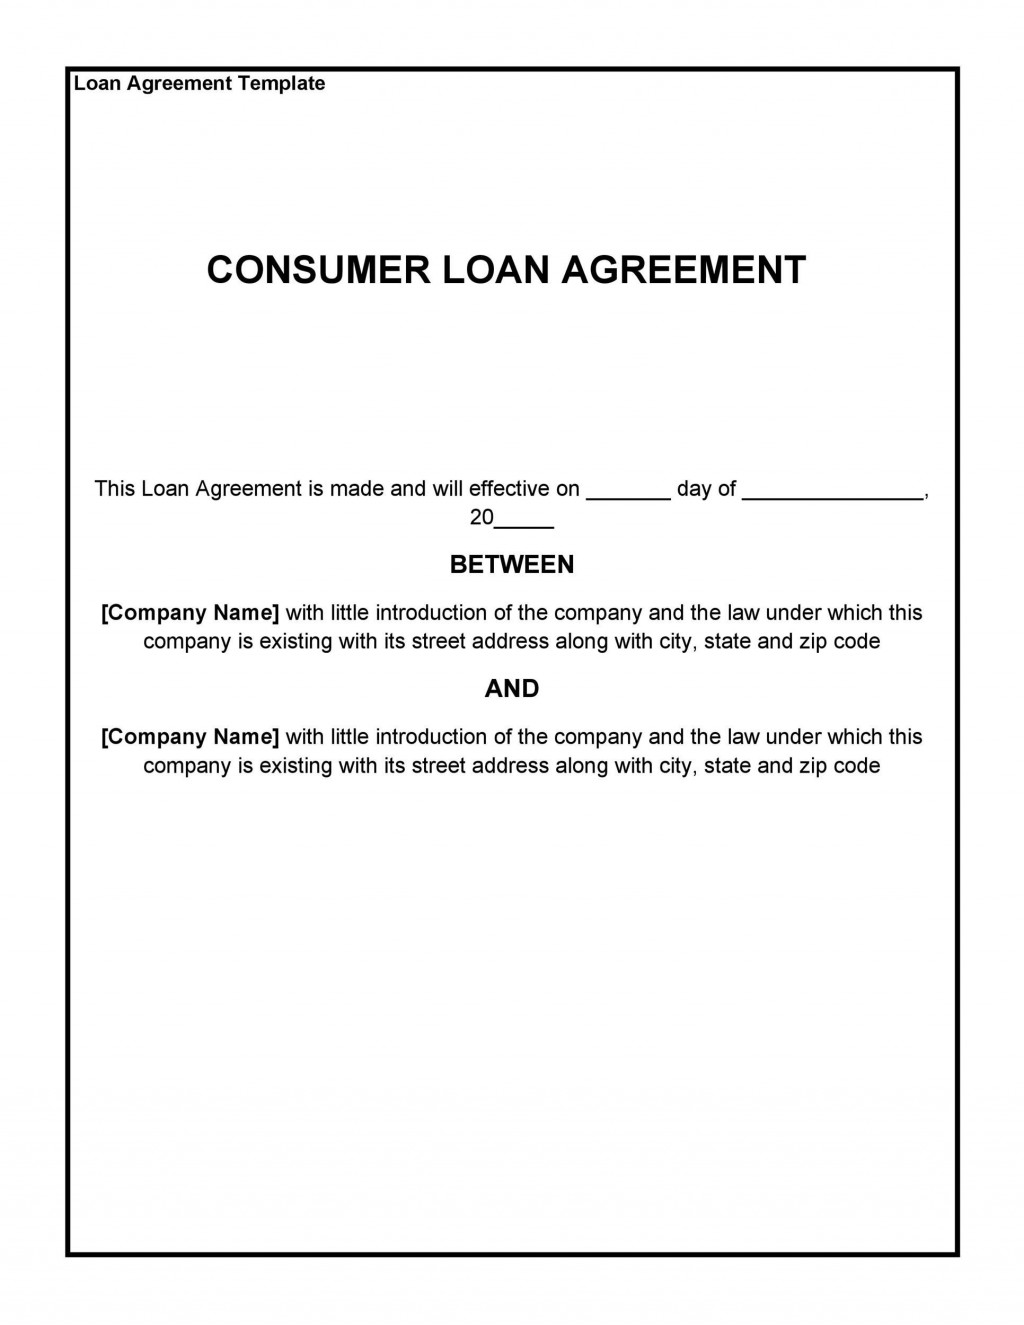 005 Dreaded Simple Loan Agreement Template Word Photo  Format Personal MicrosoftLarge